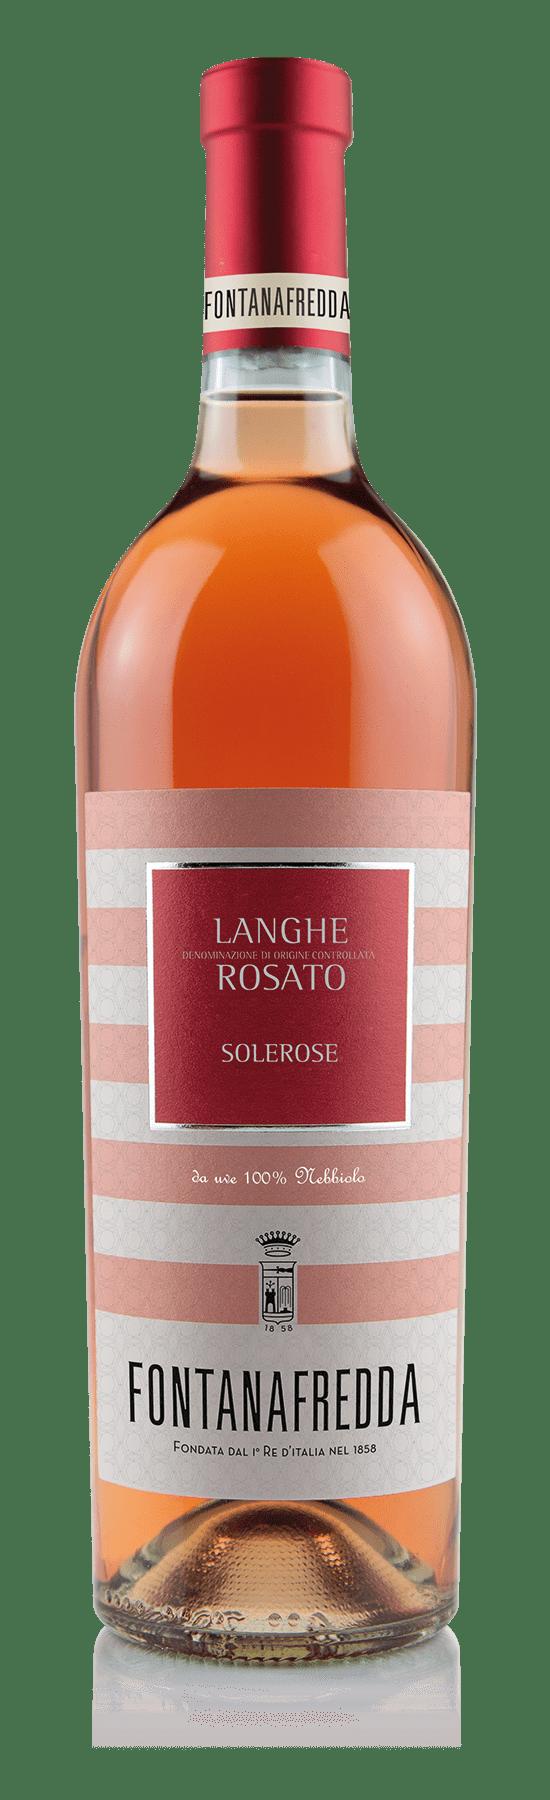 Solerose_Langhe_Rosato_Le_Righe_2020